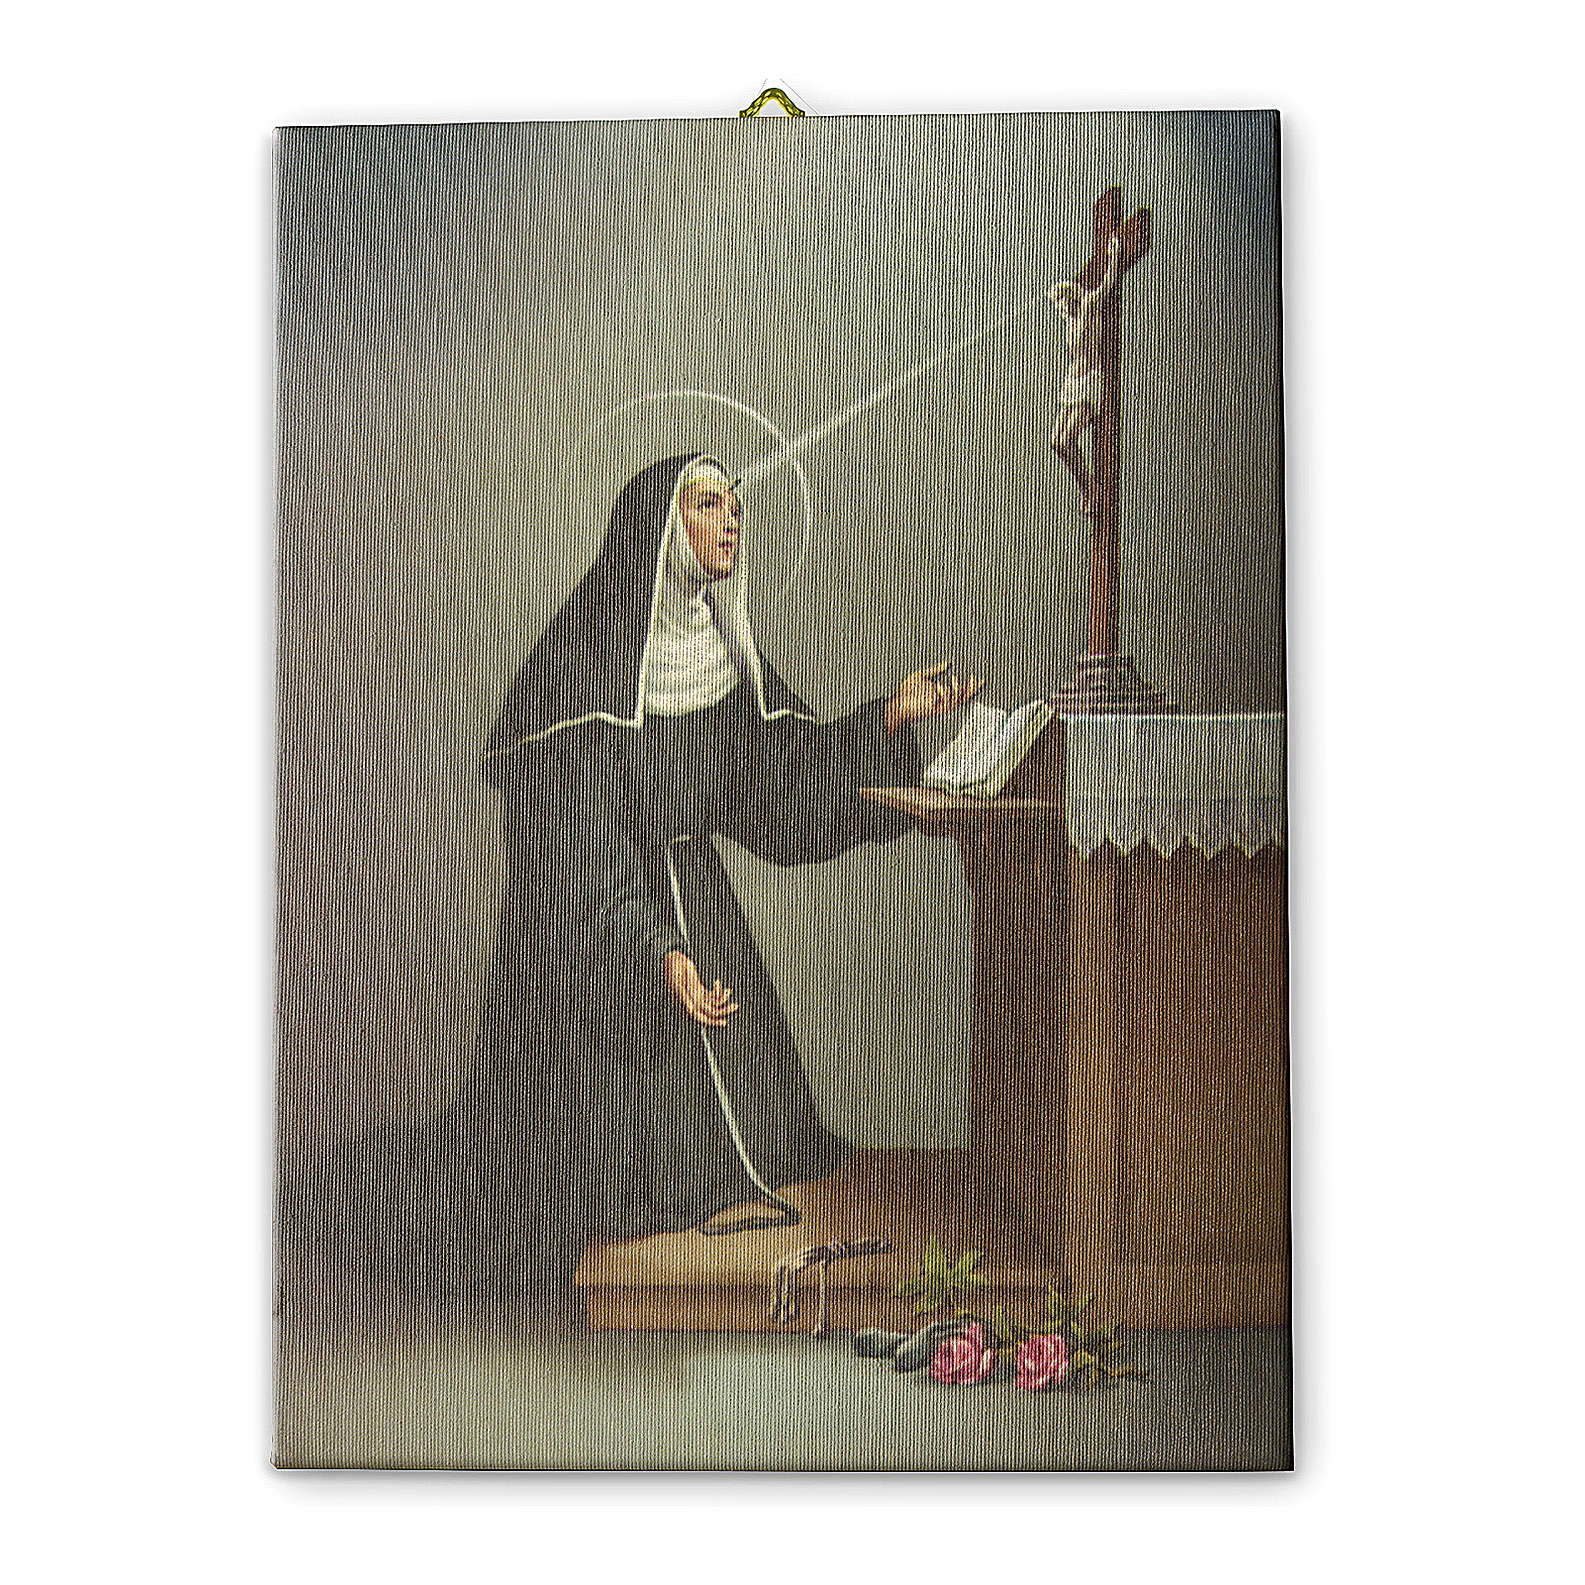 Saint Rita printed on canvas 40x30 cm 3